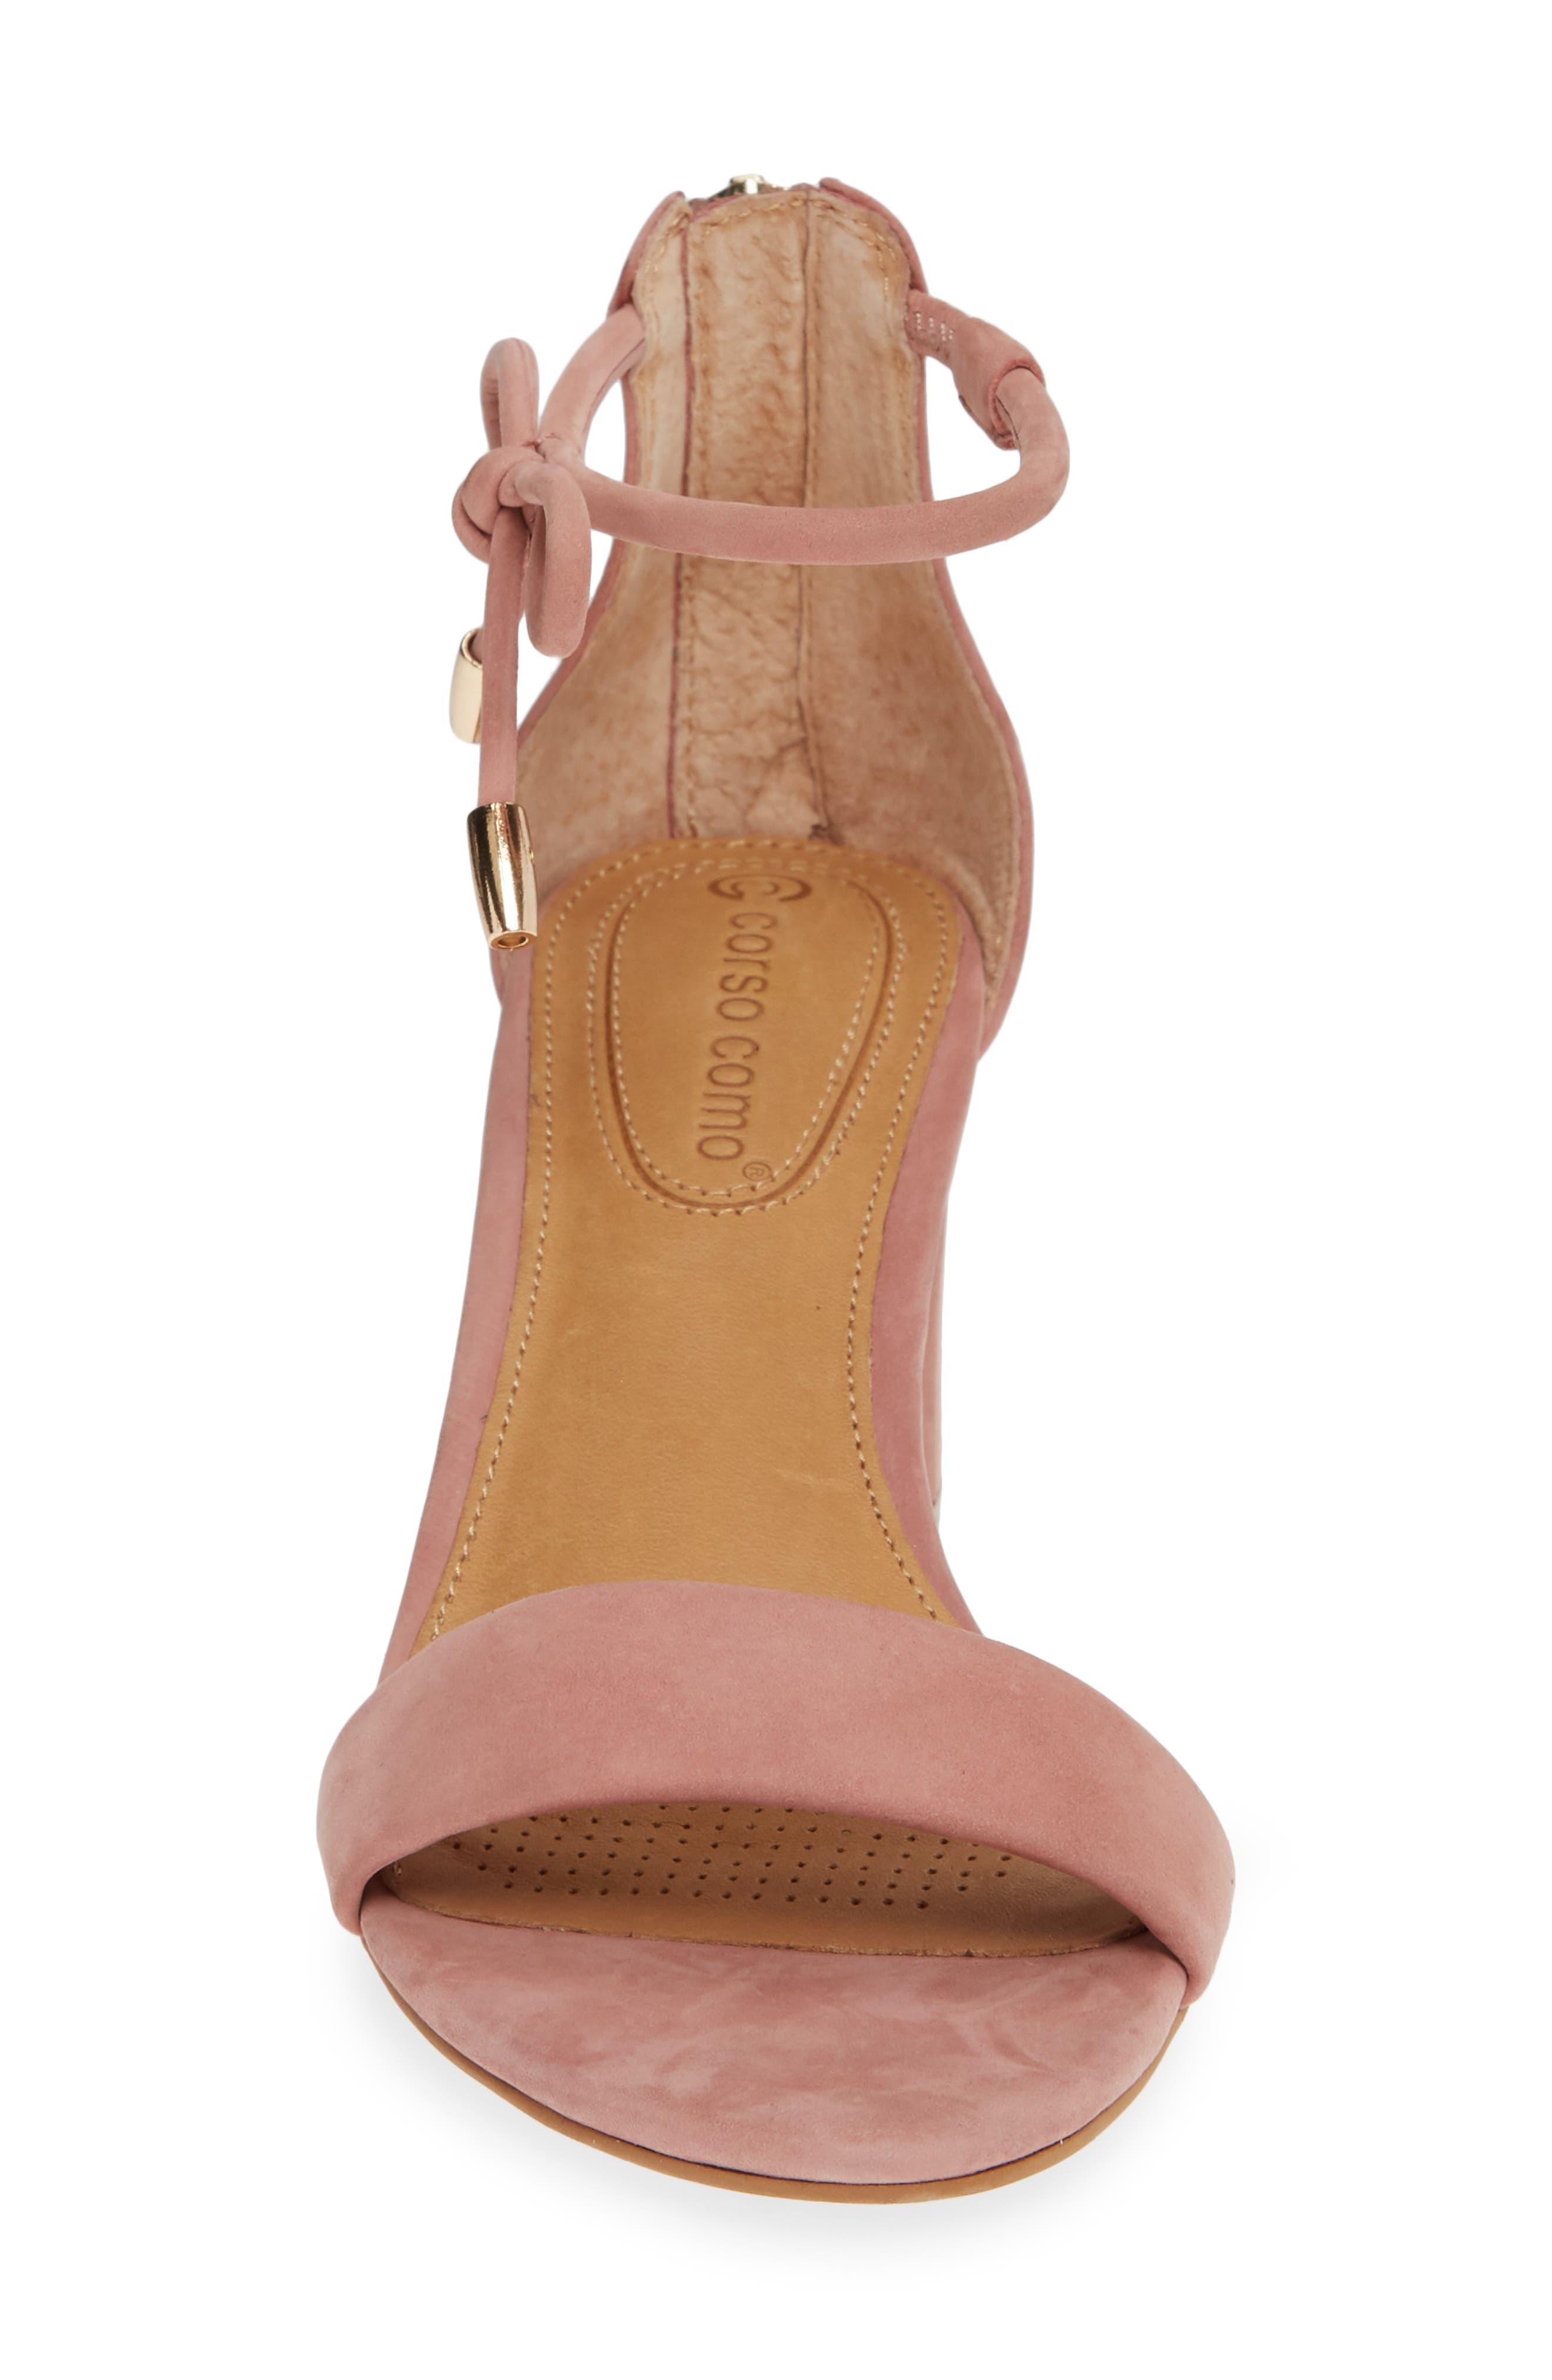 Celebratt Ankle Strap Sandal,                             Alternate thumbnail 4, color,                             OLD ROSE NUBUCK LEATHER